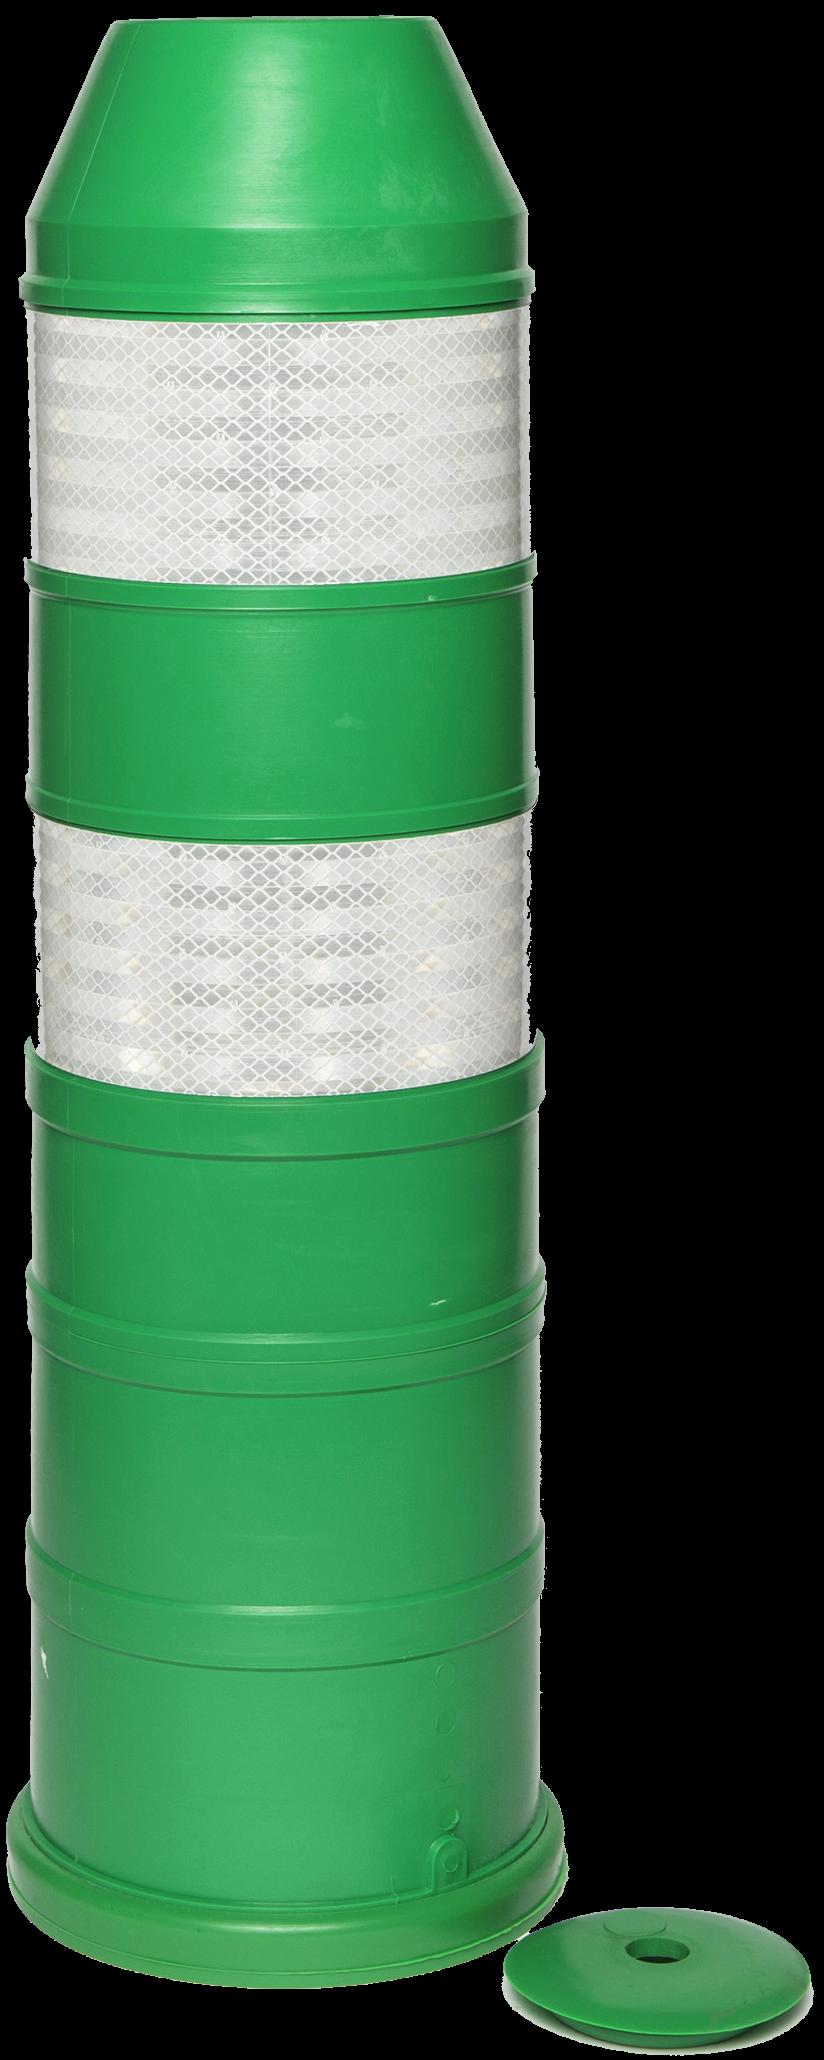 Plooibaken, diam. 220mm, H 750mm groen HI